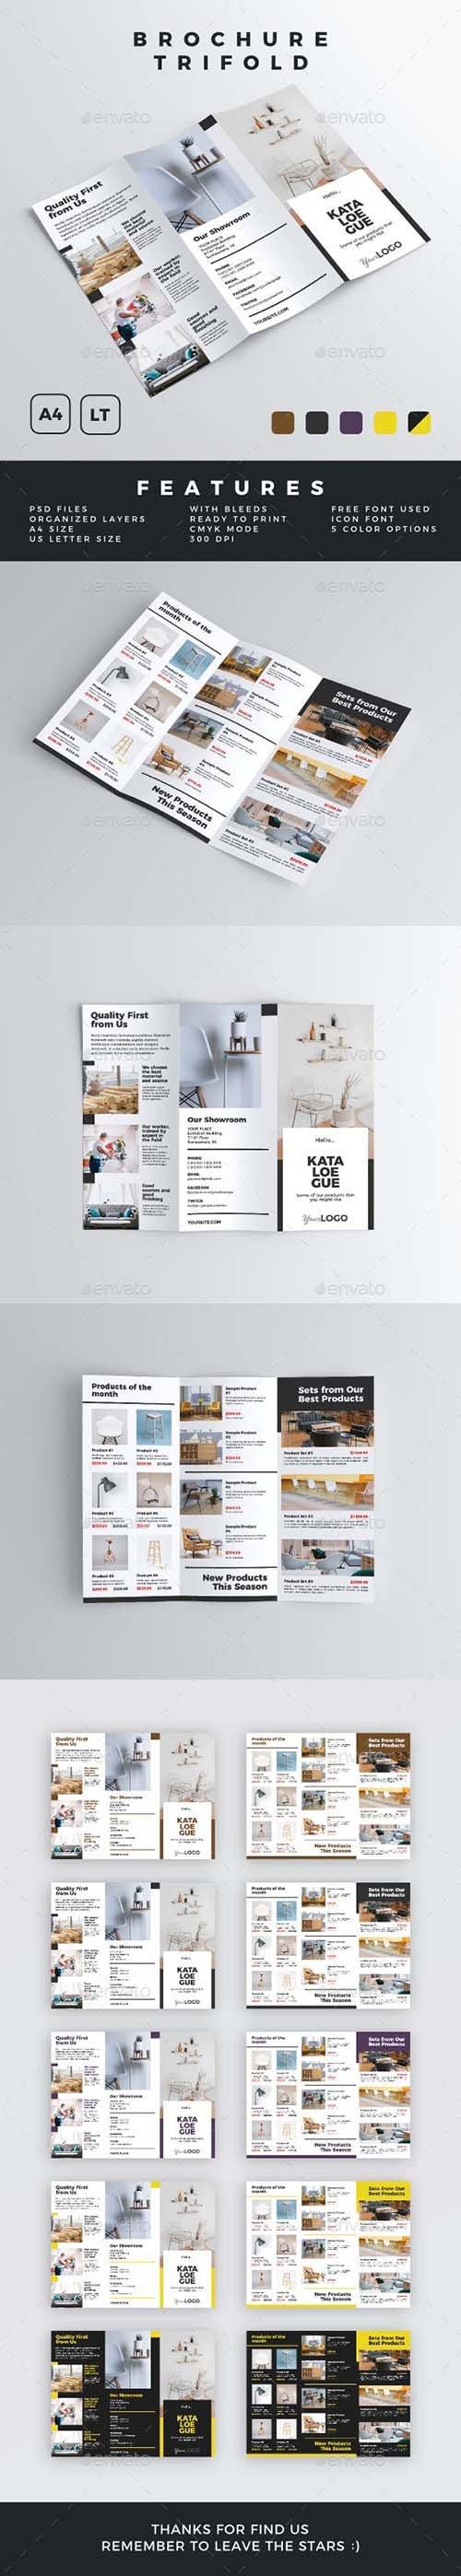 GraphicRiver - Brochure - Trifold 22878094